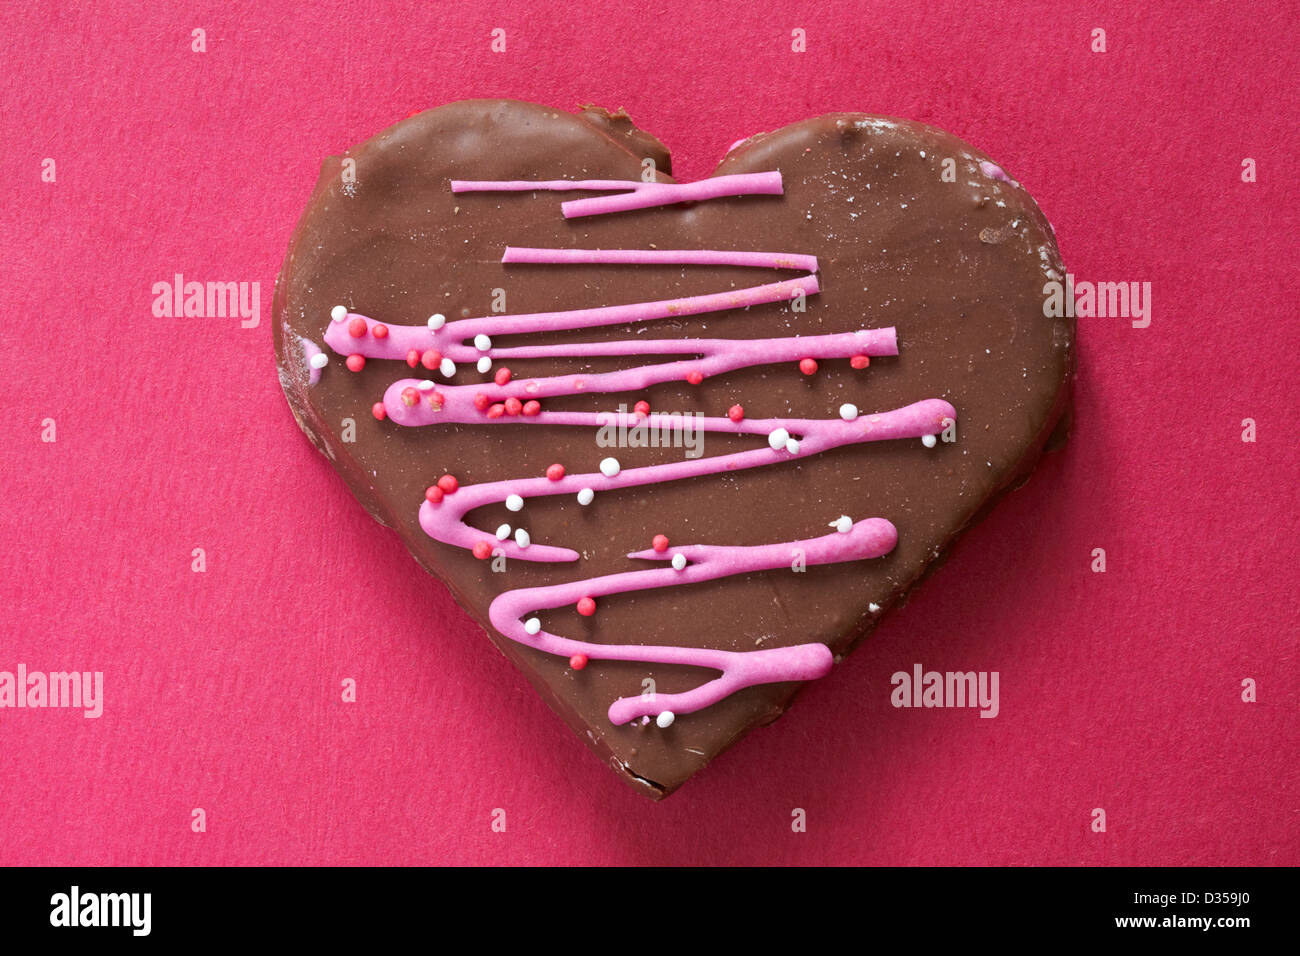 Valentine Chocolate Heart Cake Heart Shaped Cake Isolated On Pink